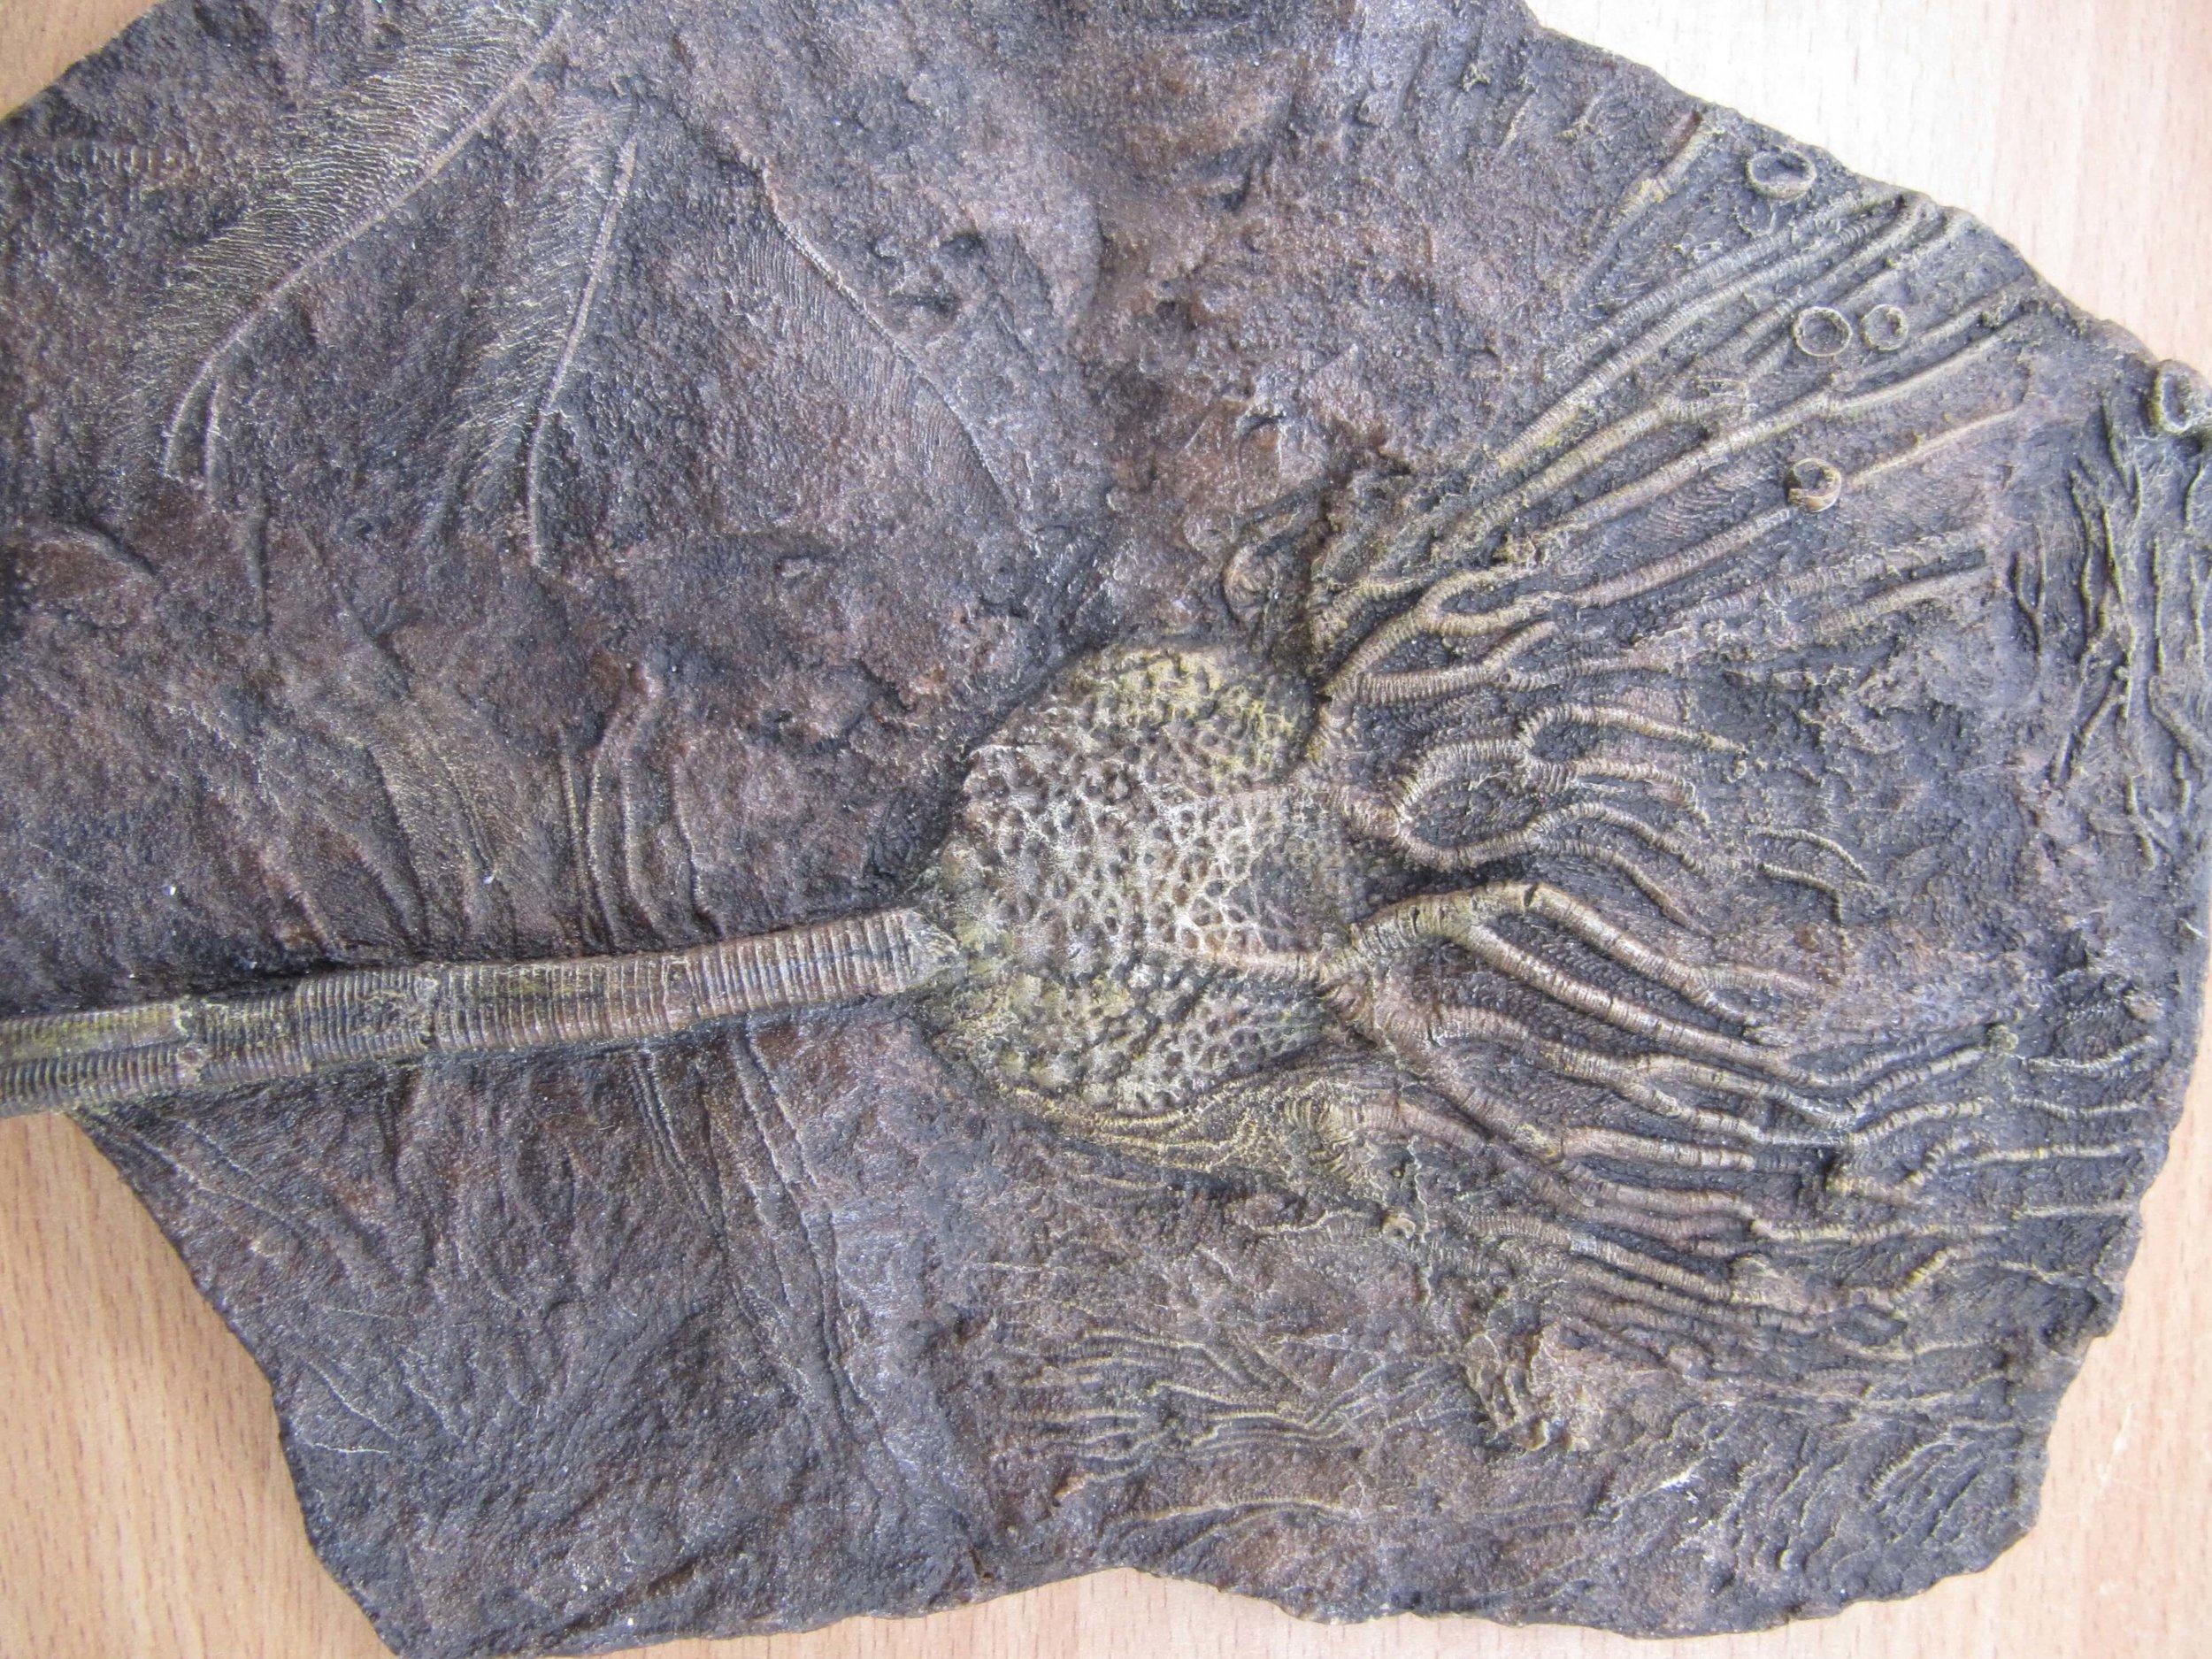 Crinoid fossil